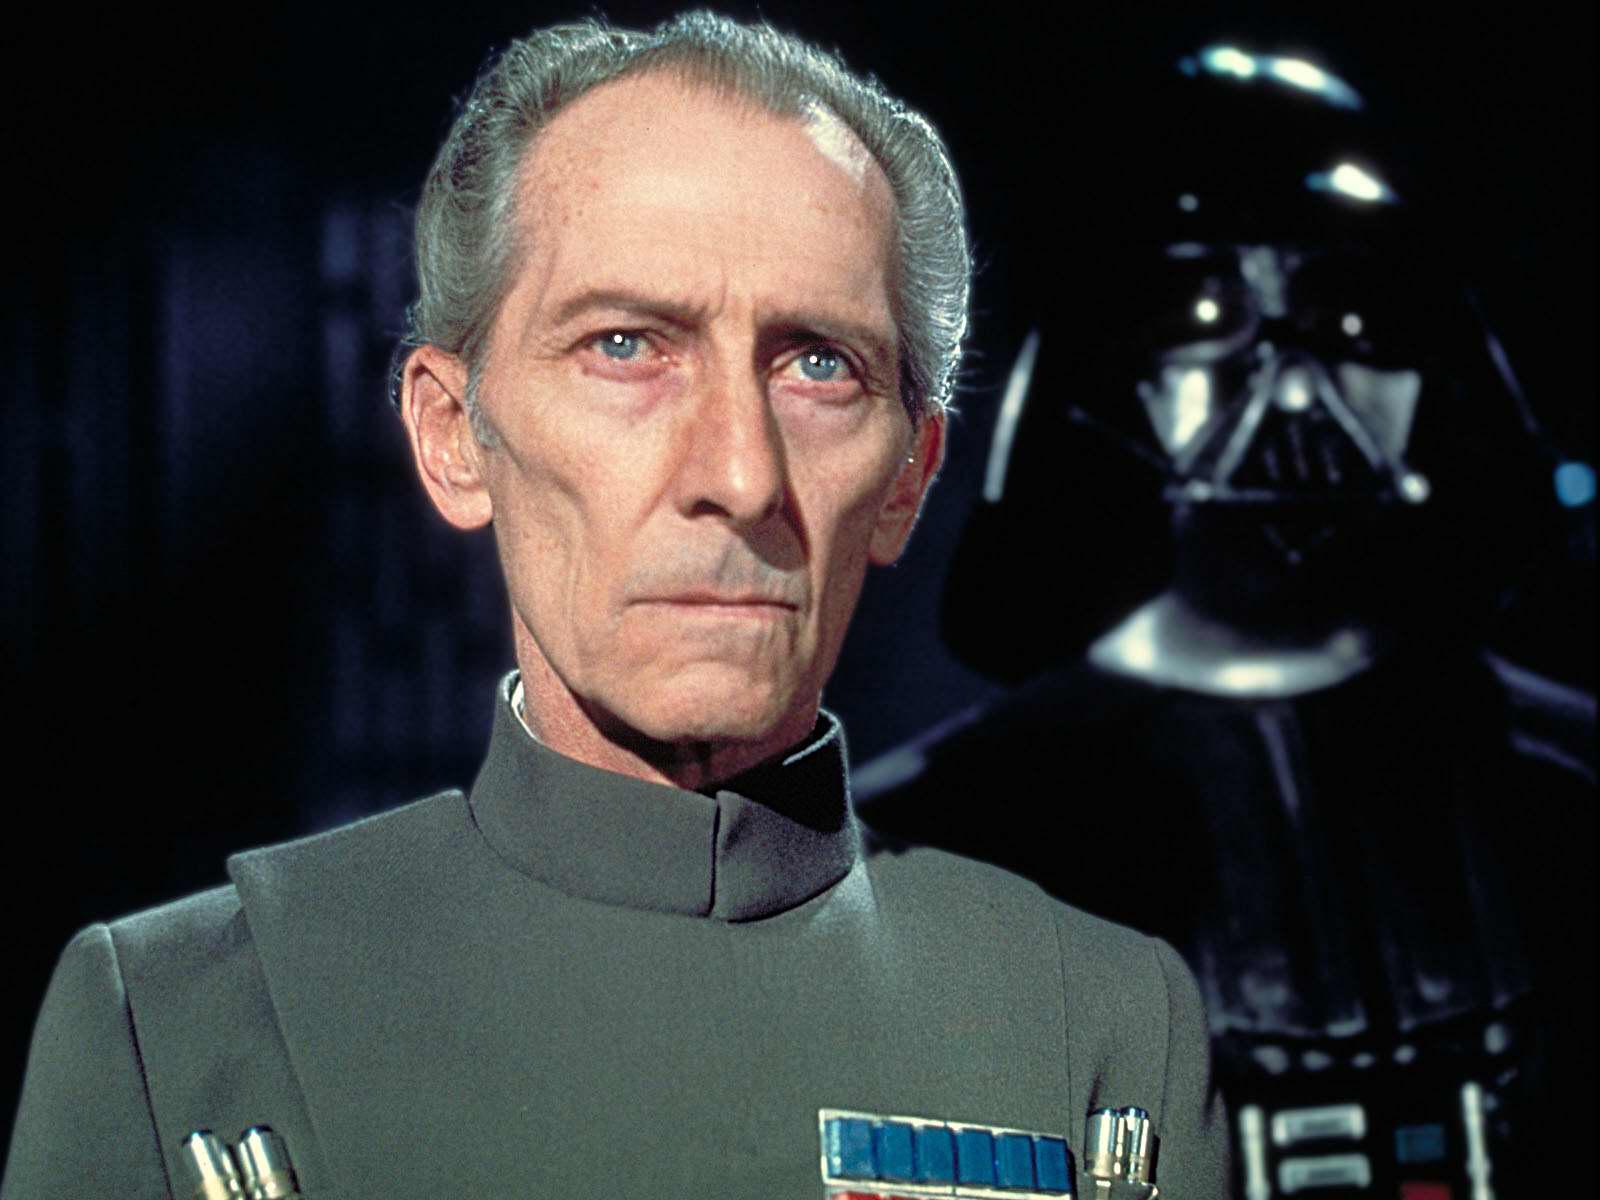 ¿Regresará Peter Cushing en modo digitalizado en Star Wars: Rogue One?